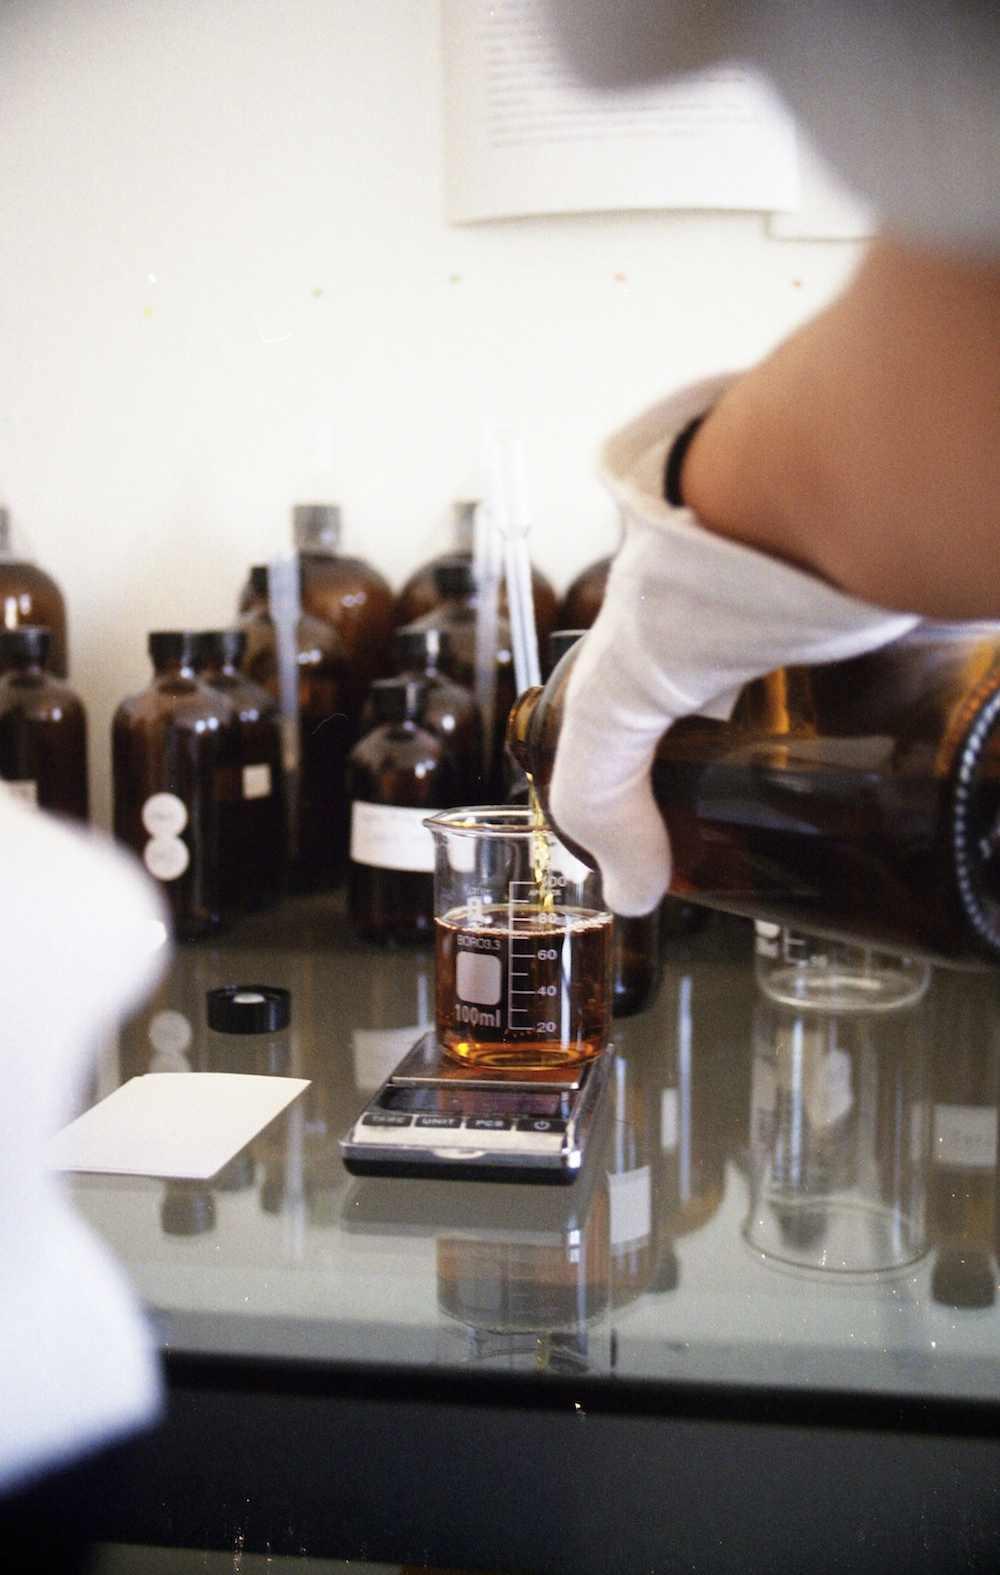 Private Label Fragrances